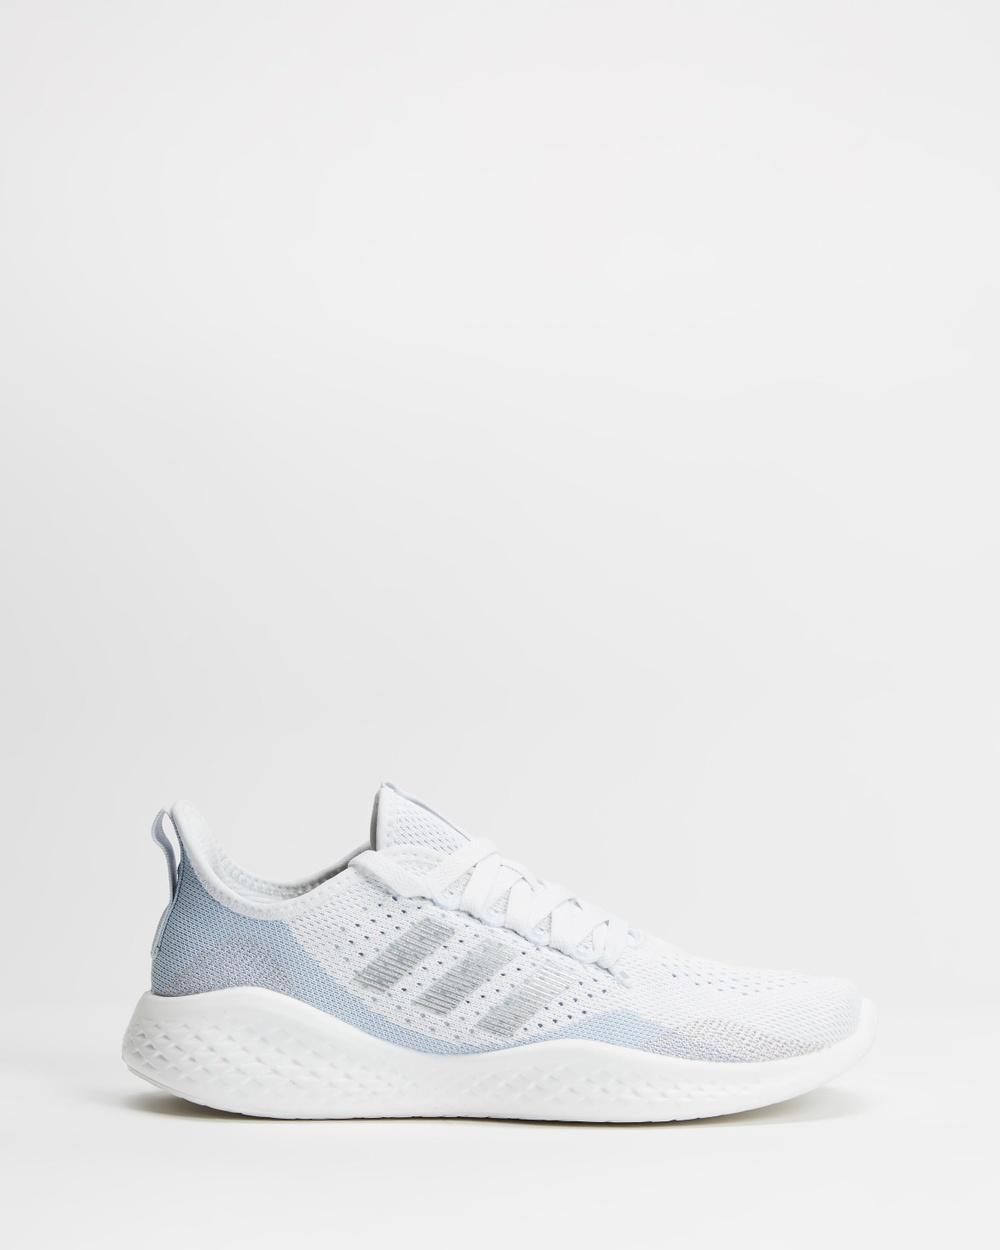 adidas Performance Fluidflow 2.0 Women's Shoes White, Metallic Silver & Halo Blue